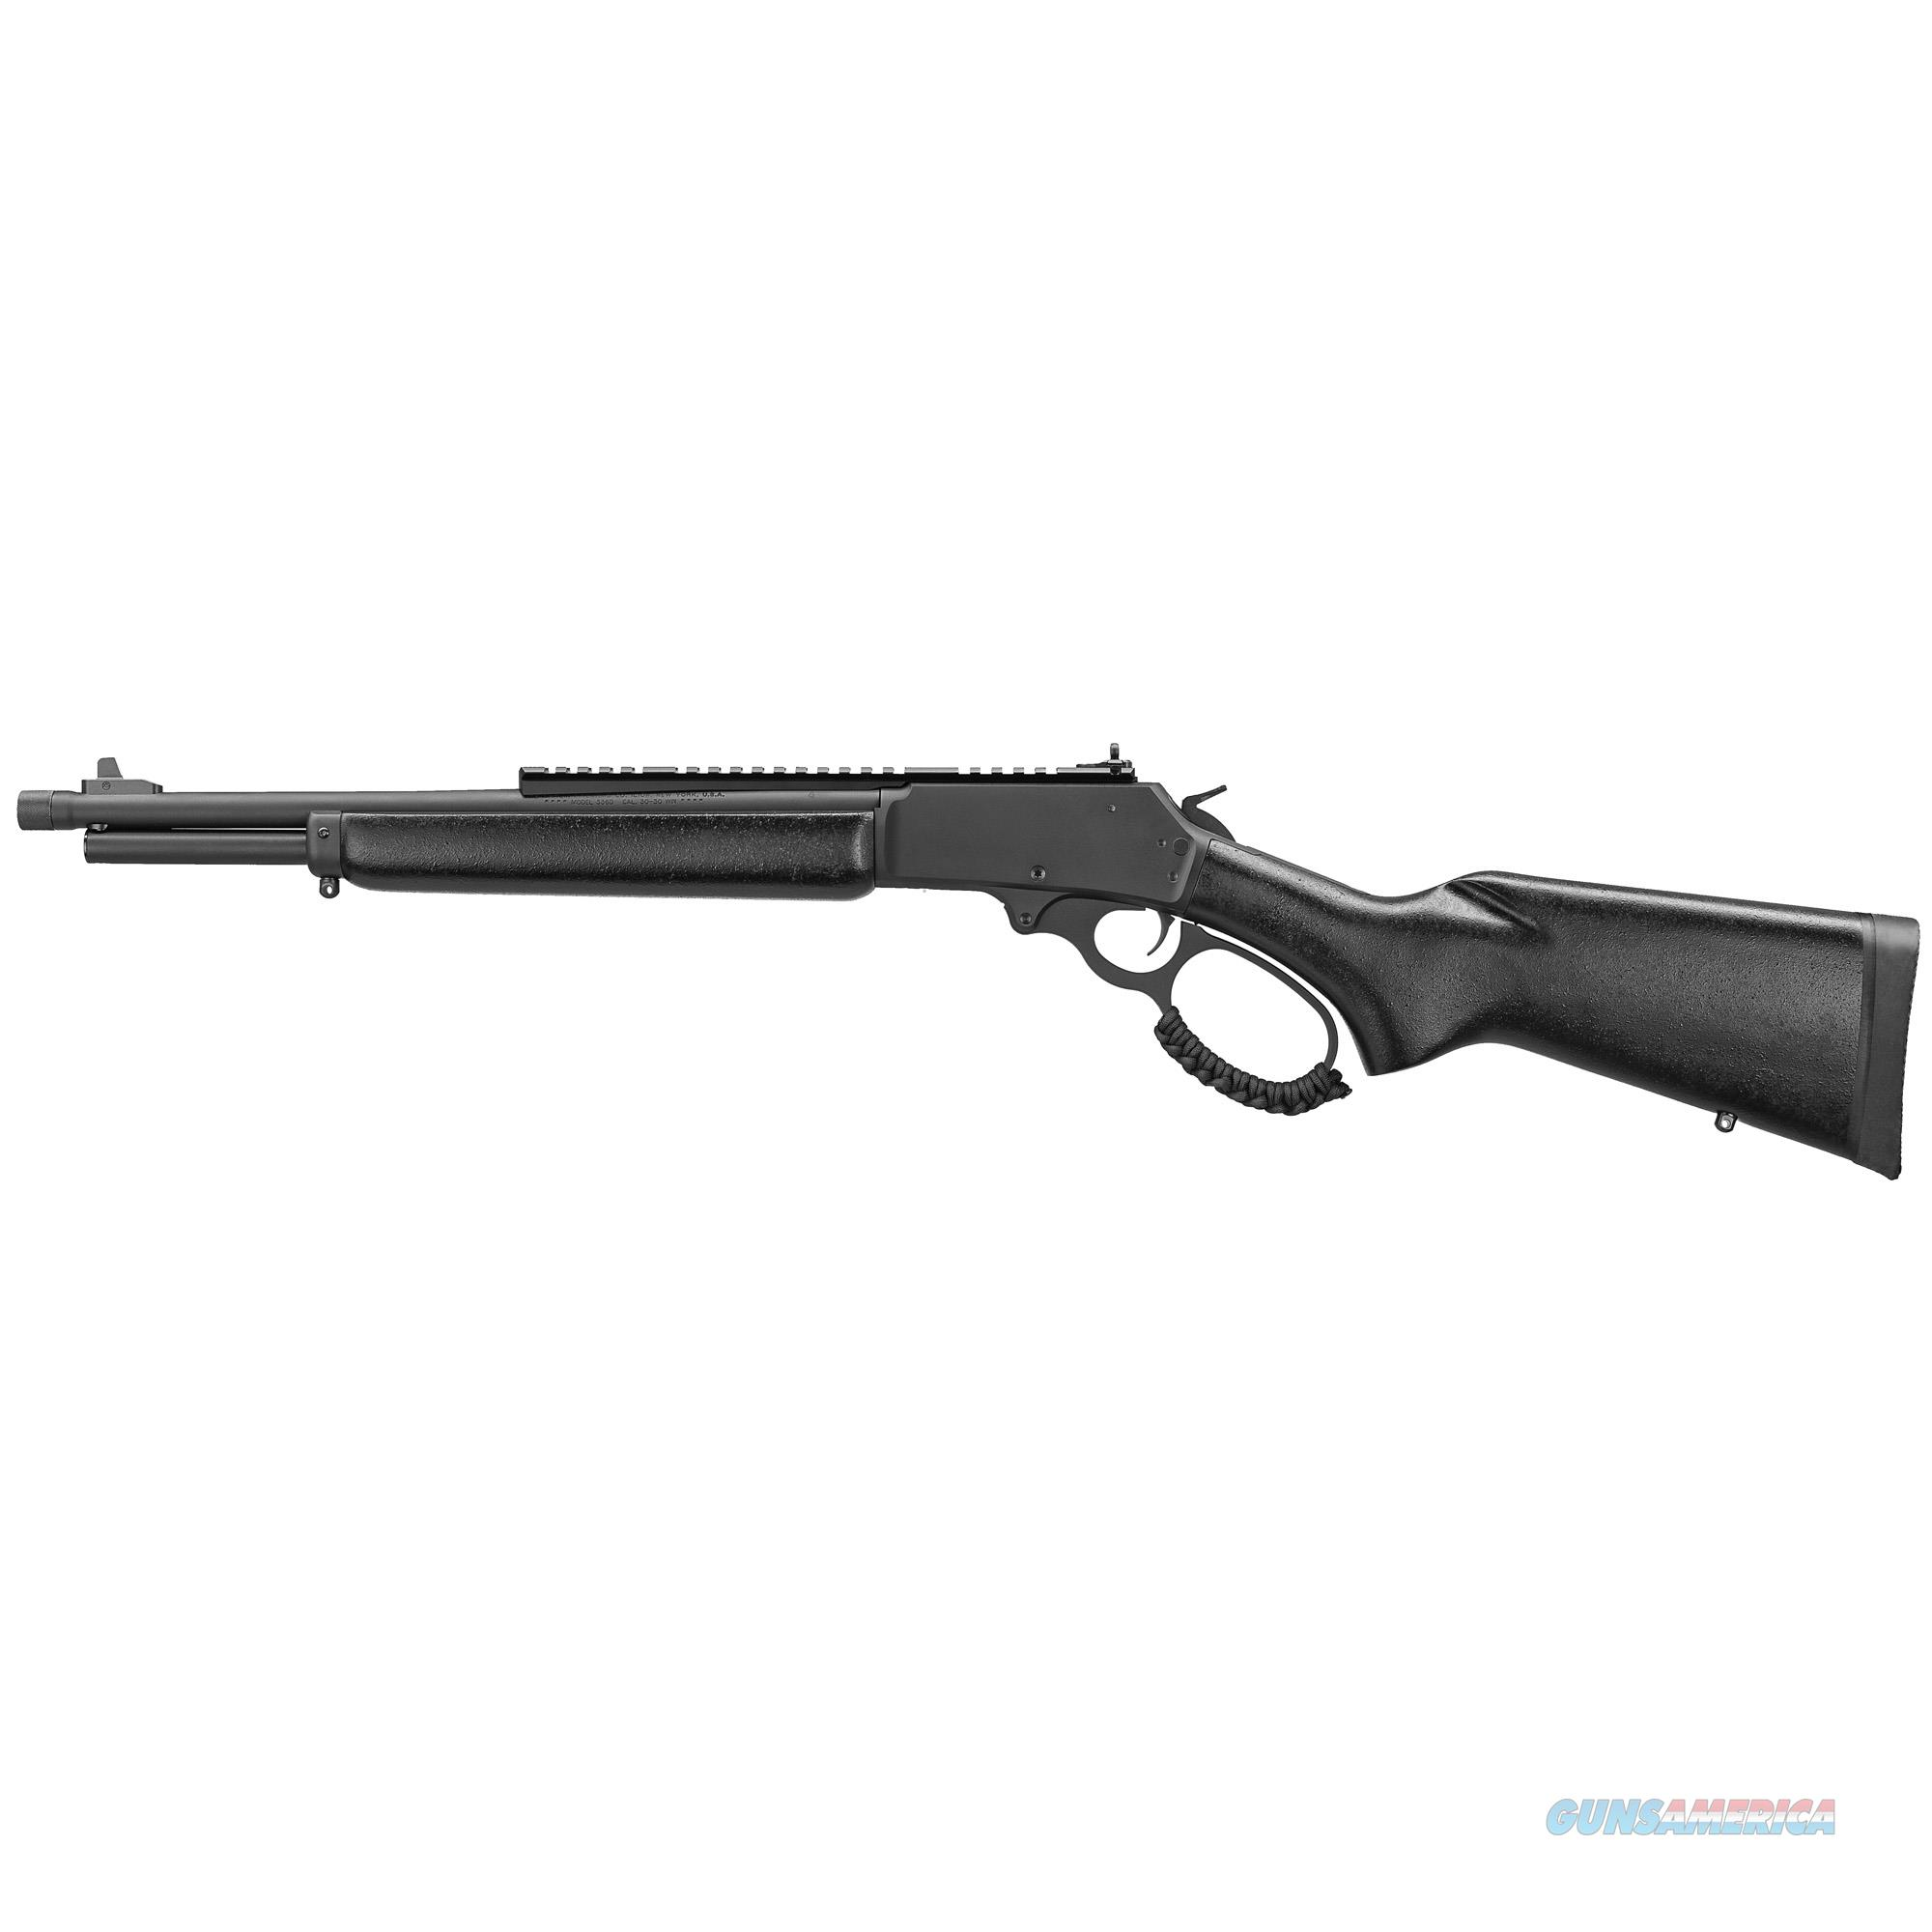 "Marlin 336 Dark .30-30 Win 16.25"" Threaded  Guns > Rifles > Marlin Rifles > Modern > Lever Action"